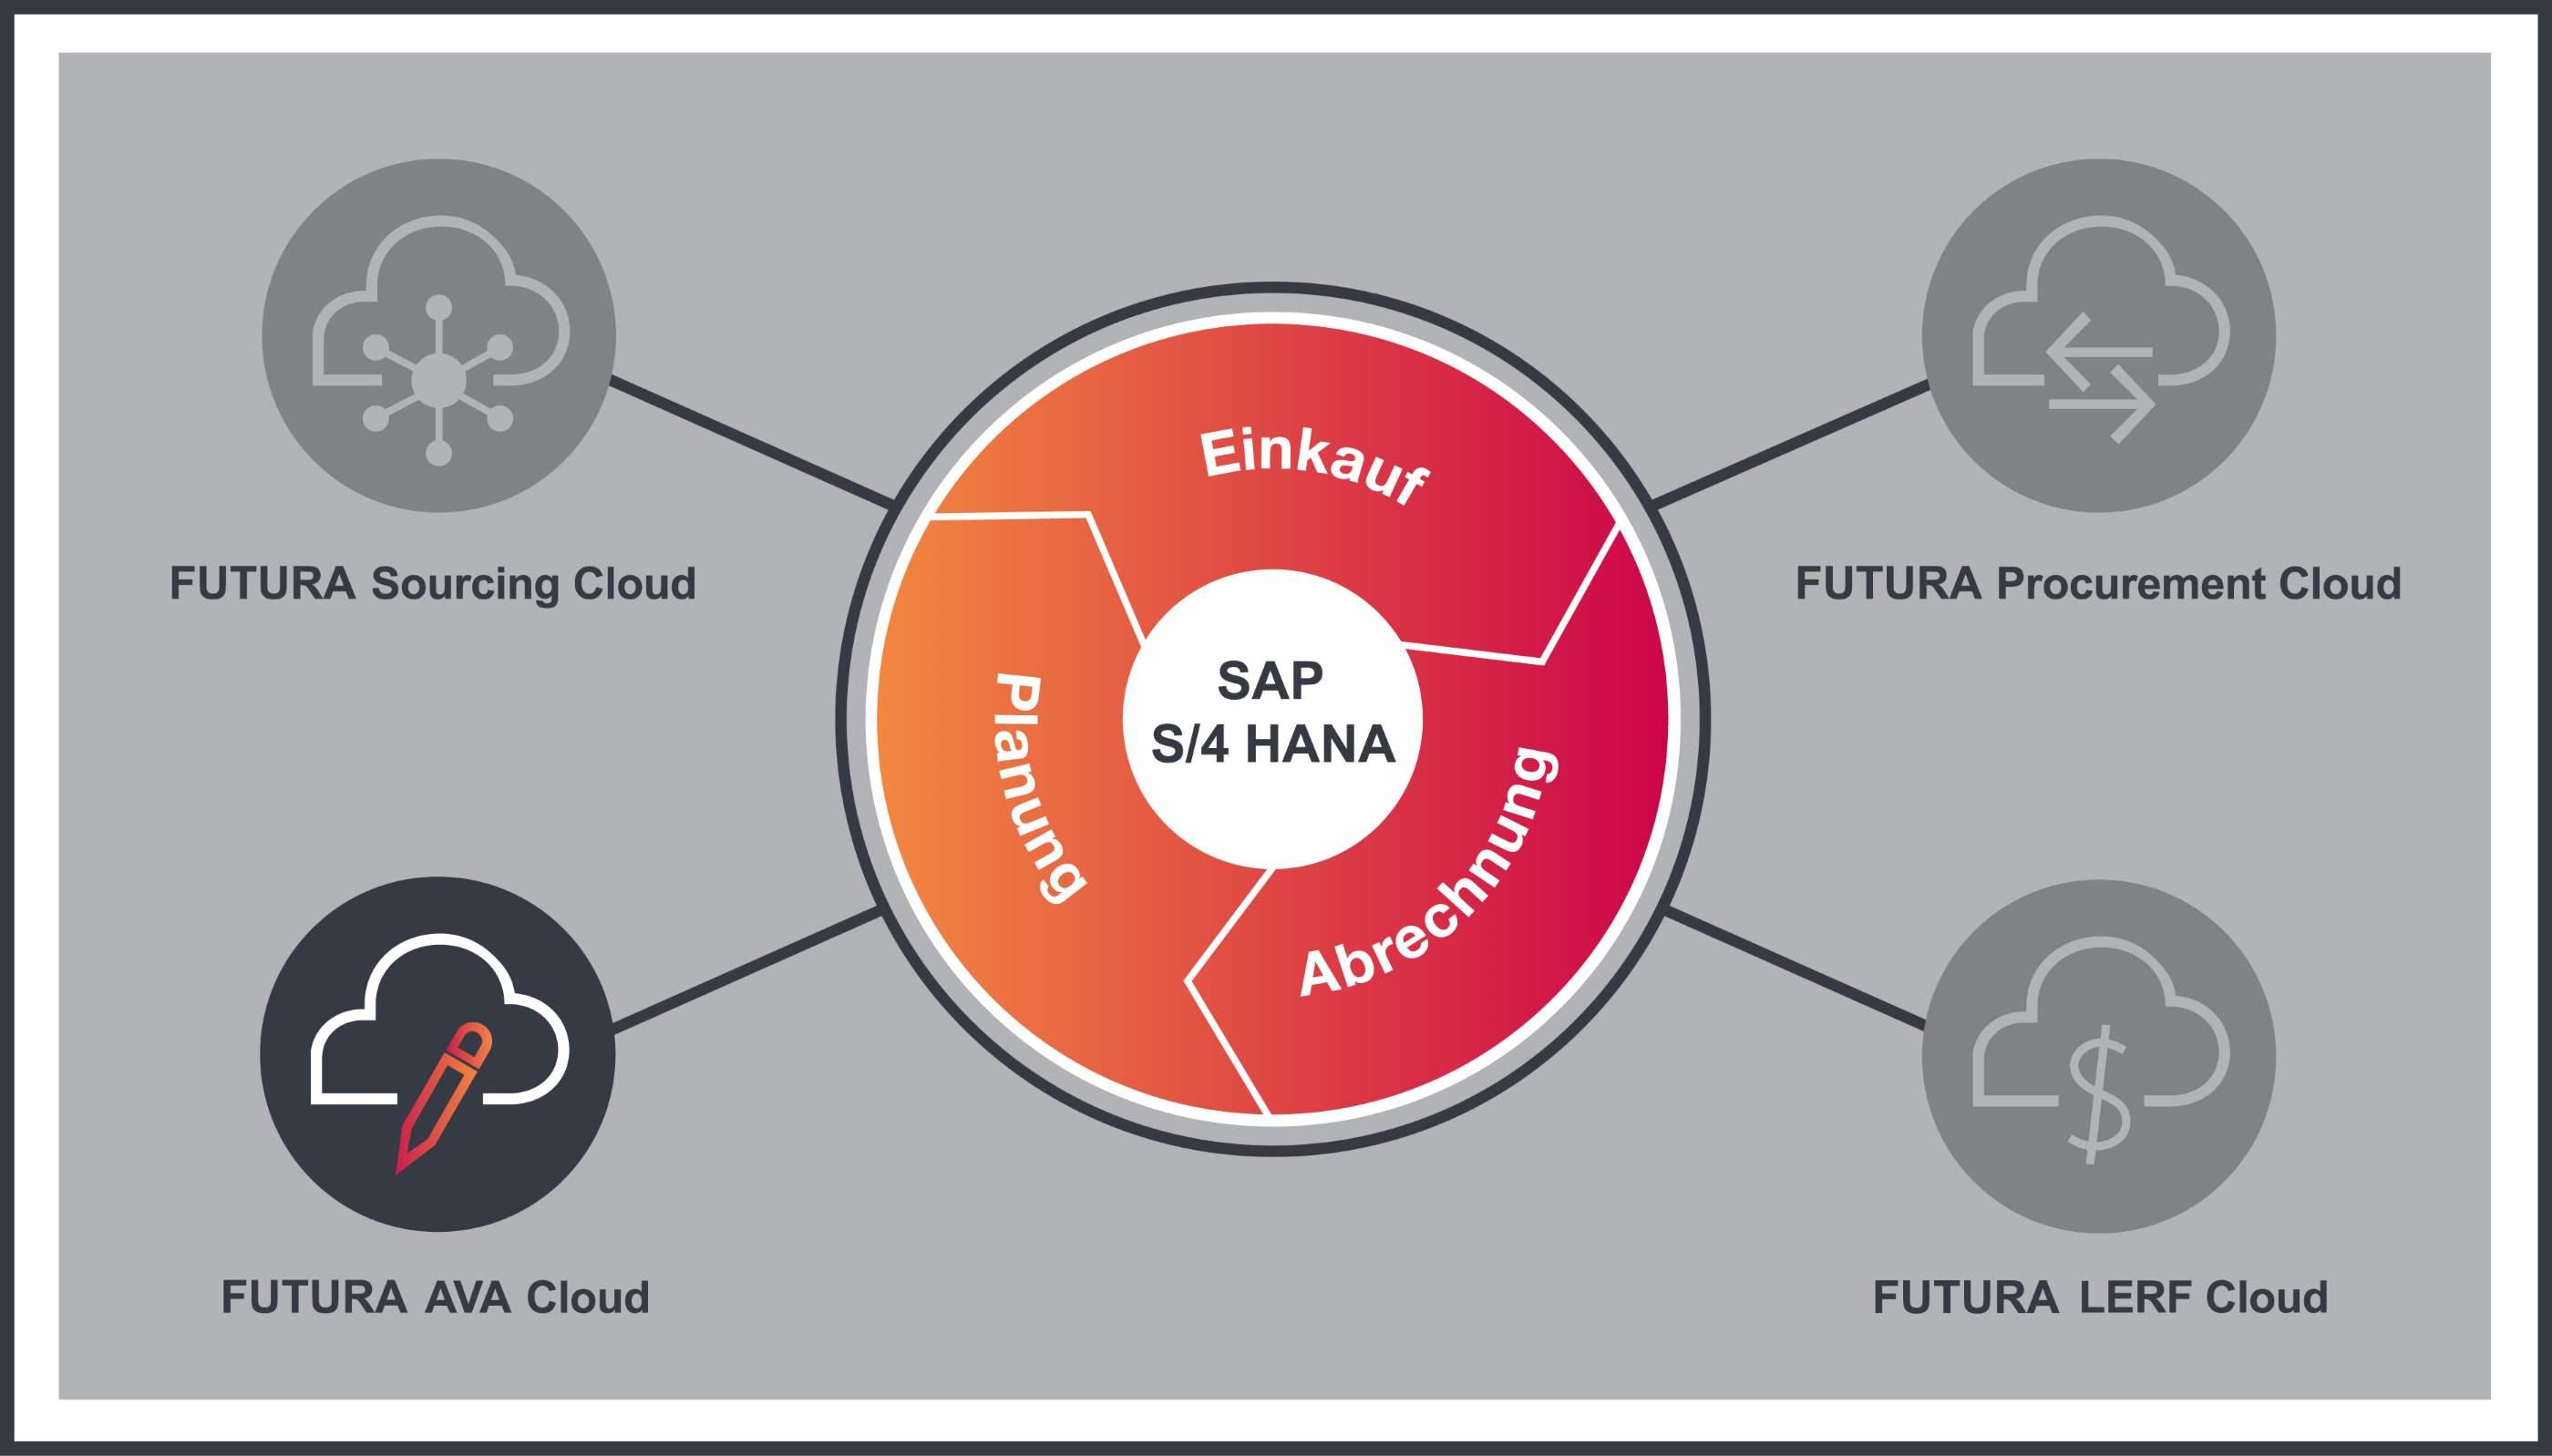 Kreislaufgrafik zur FUTURA AVA Cloud